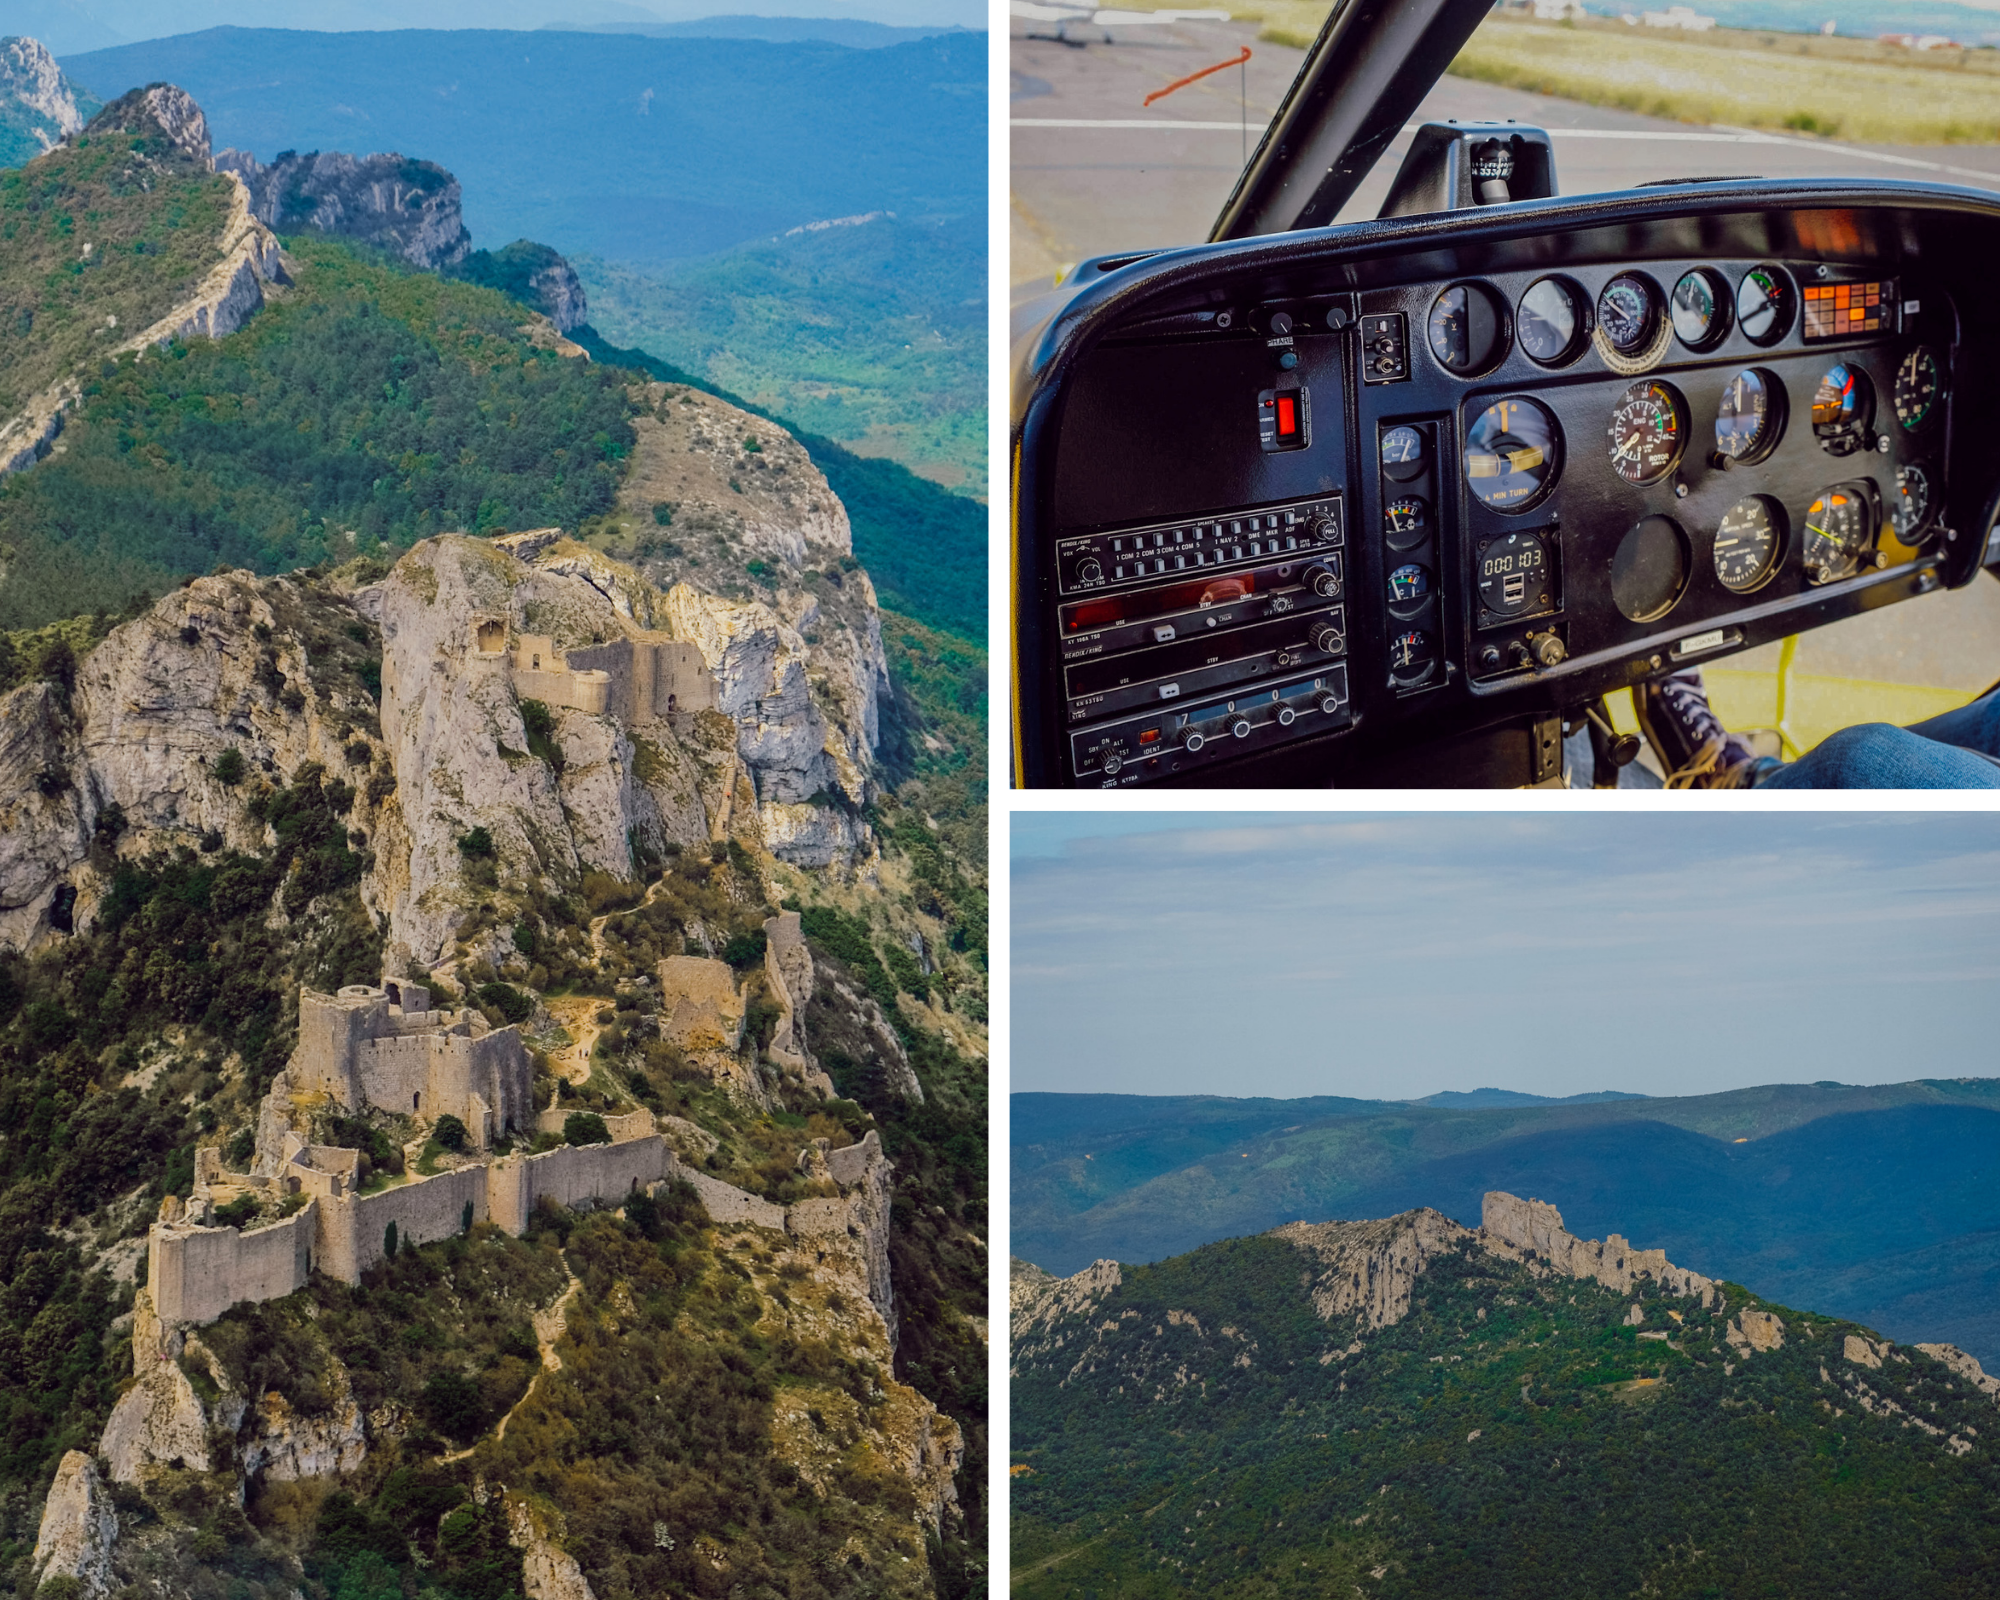 Chateaux Cathares en Hélicoptère